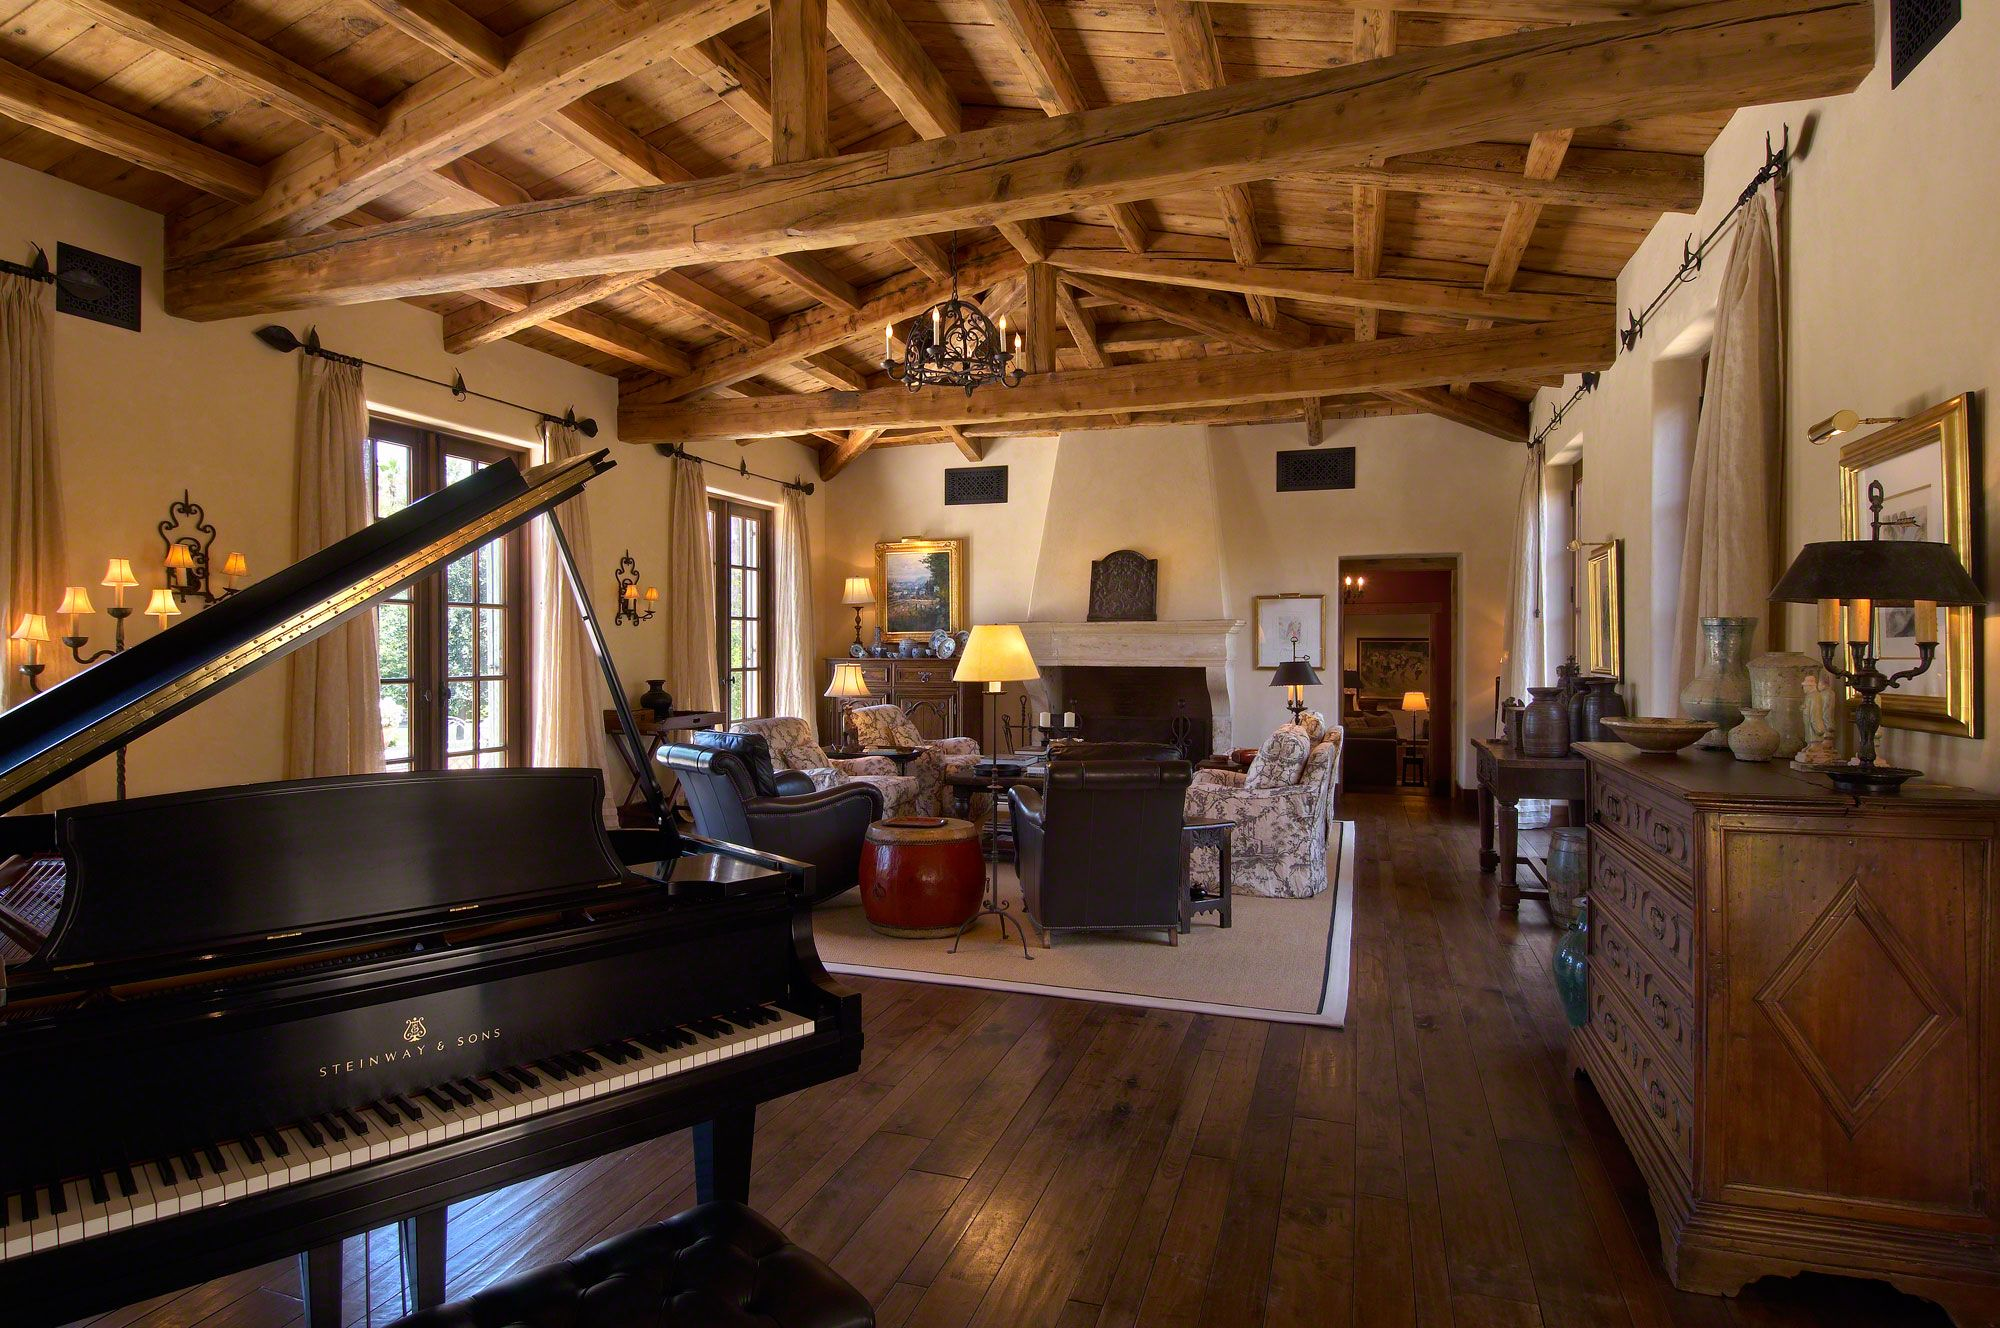 Best Kitchen Gallery: A Great Space For Entertaining Az Italian Villa Estate Luxury of Scottsdale Arizona Home Builder on rachelxblog.com